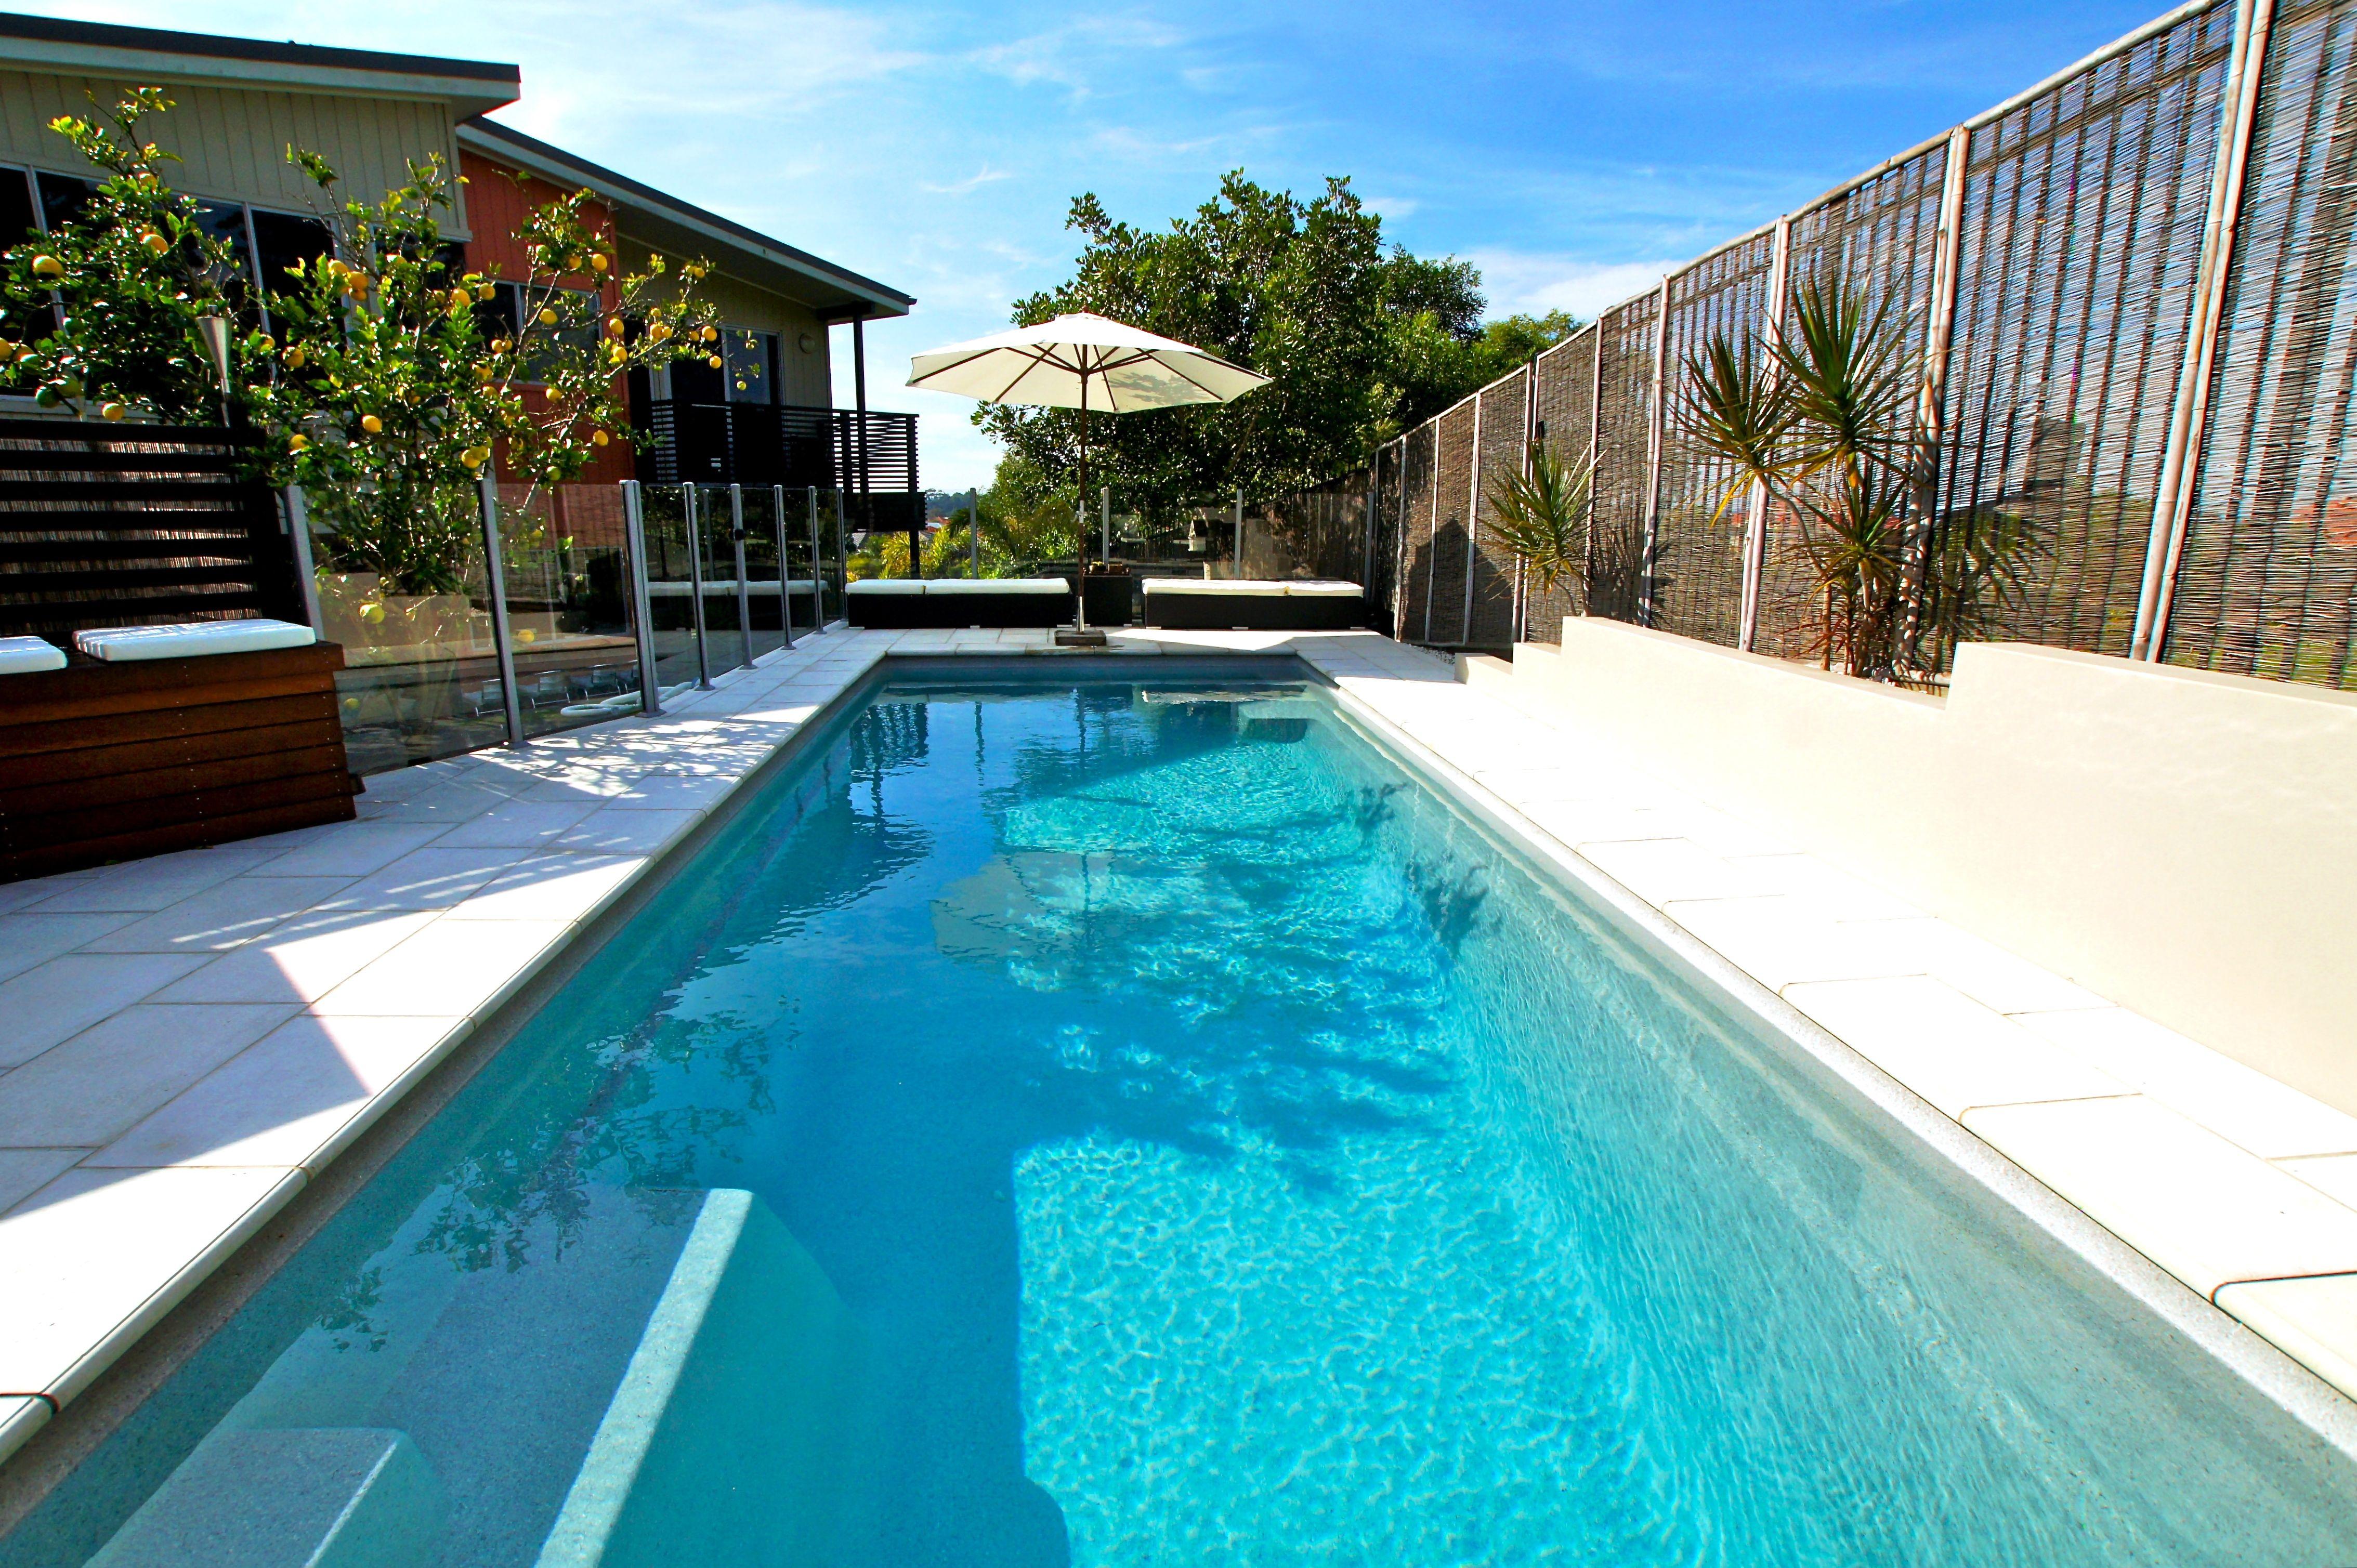 The Madeira pool is a modern sleek